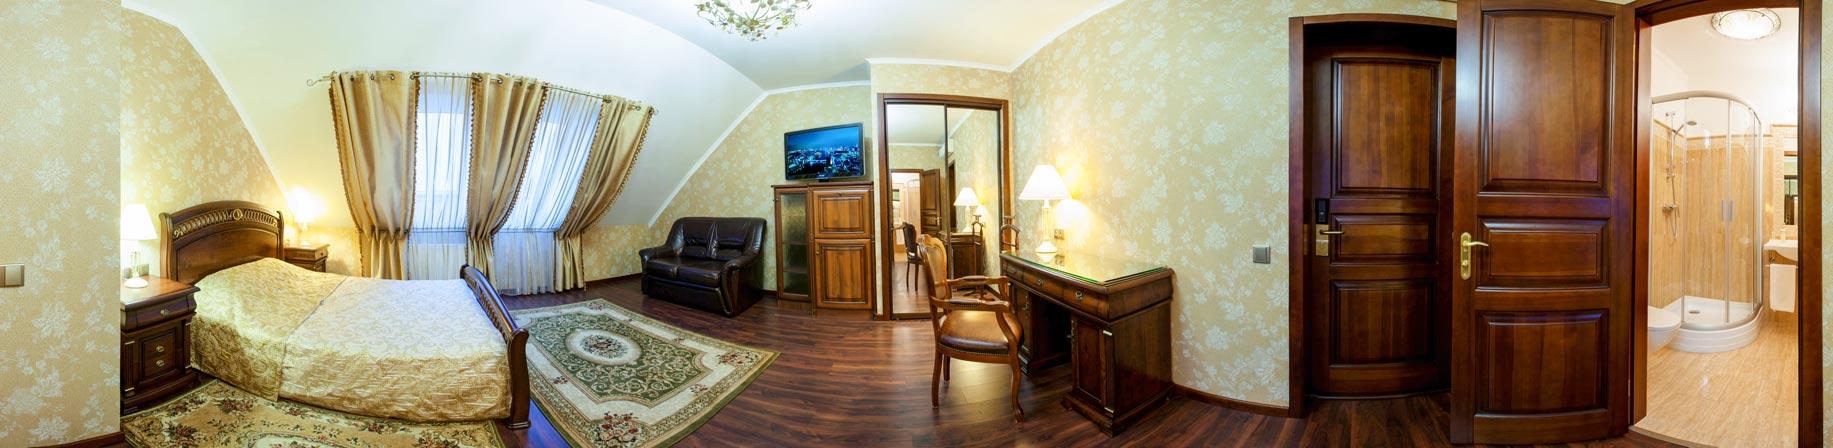 Hotel helicopter in kremenchug ukraine mansard suite for Mansard room